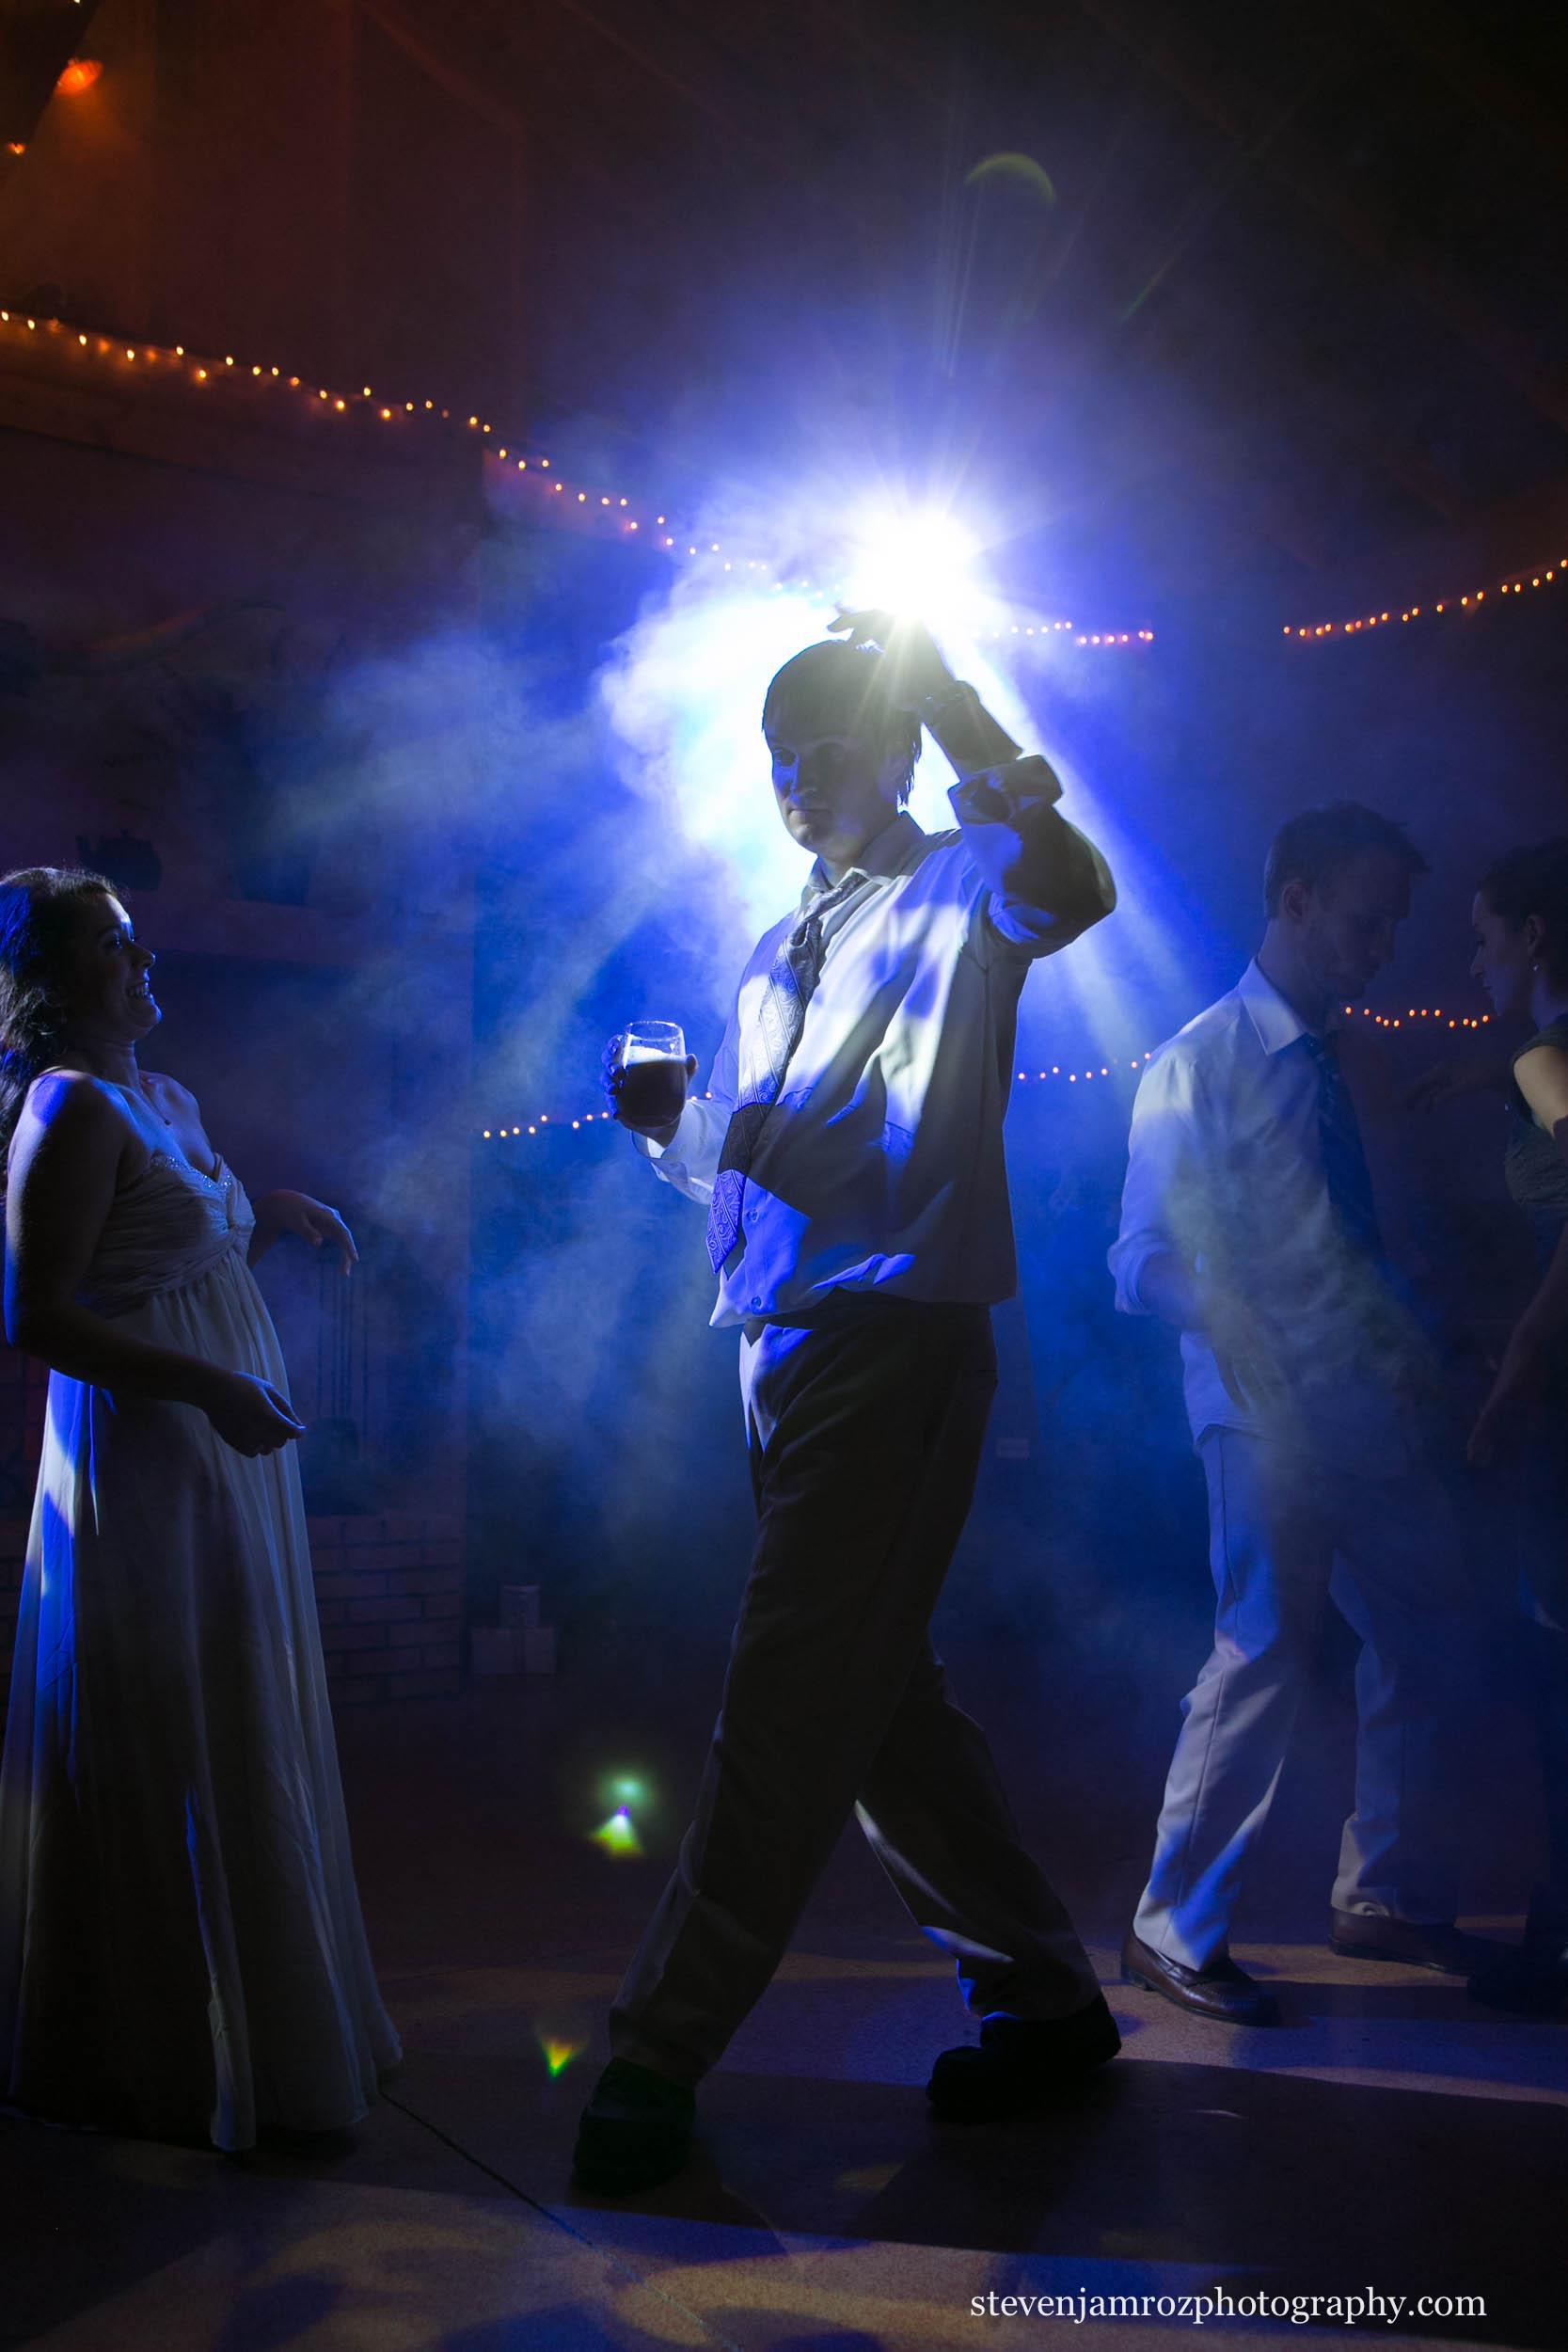 lighting-reception-wedding-smoke-steven-jamroz-photography-0378.jpg